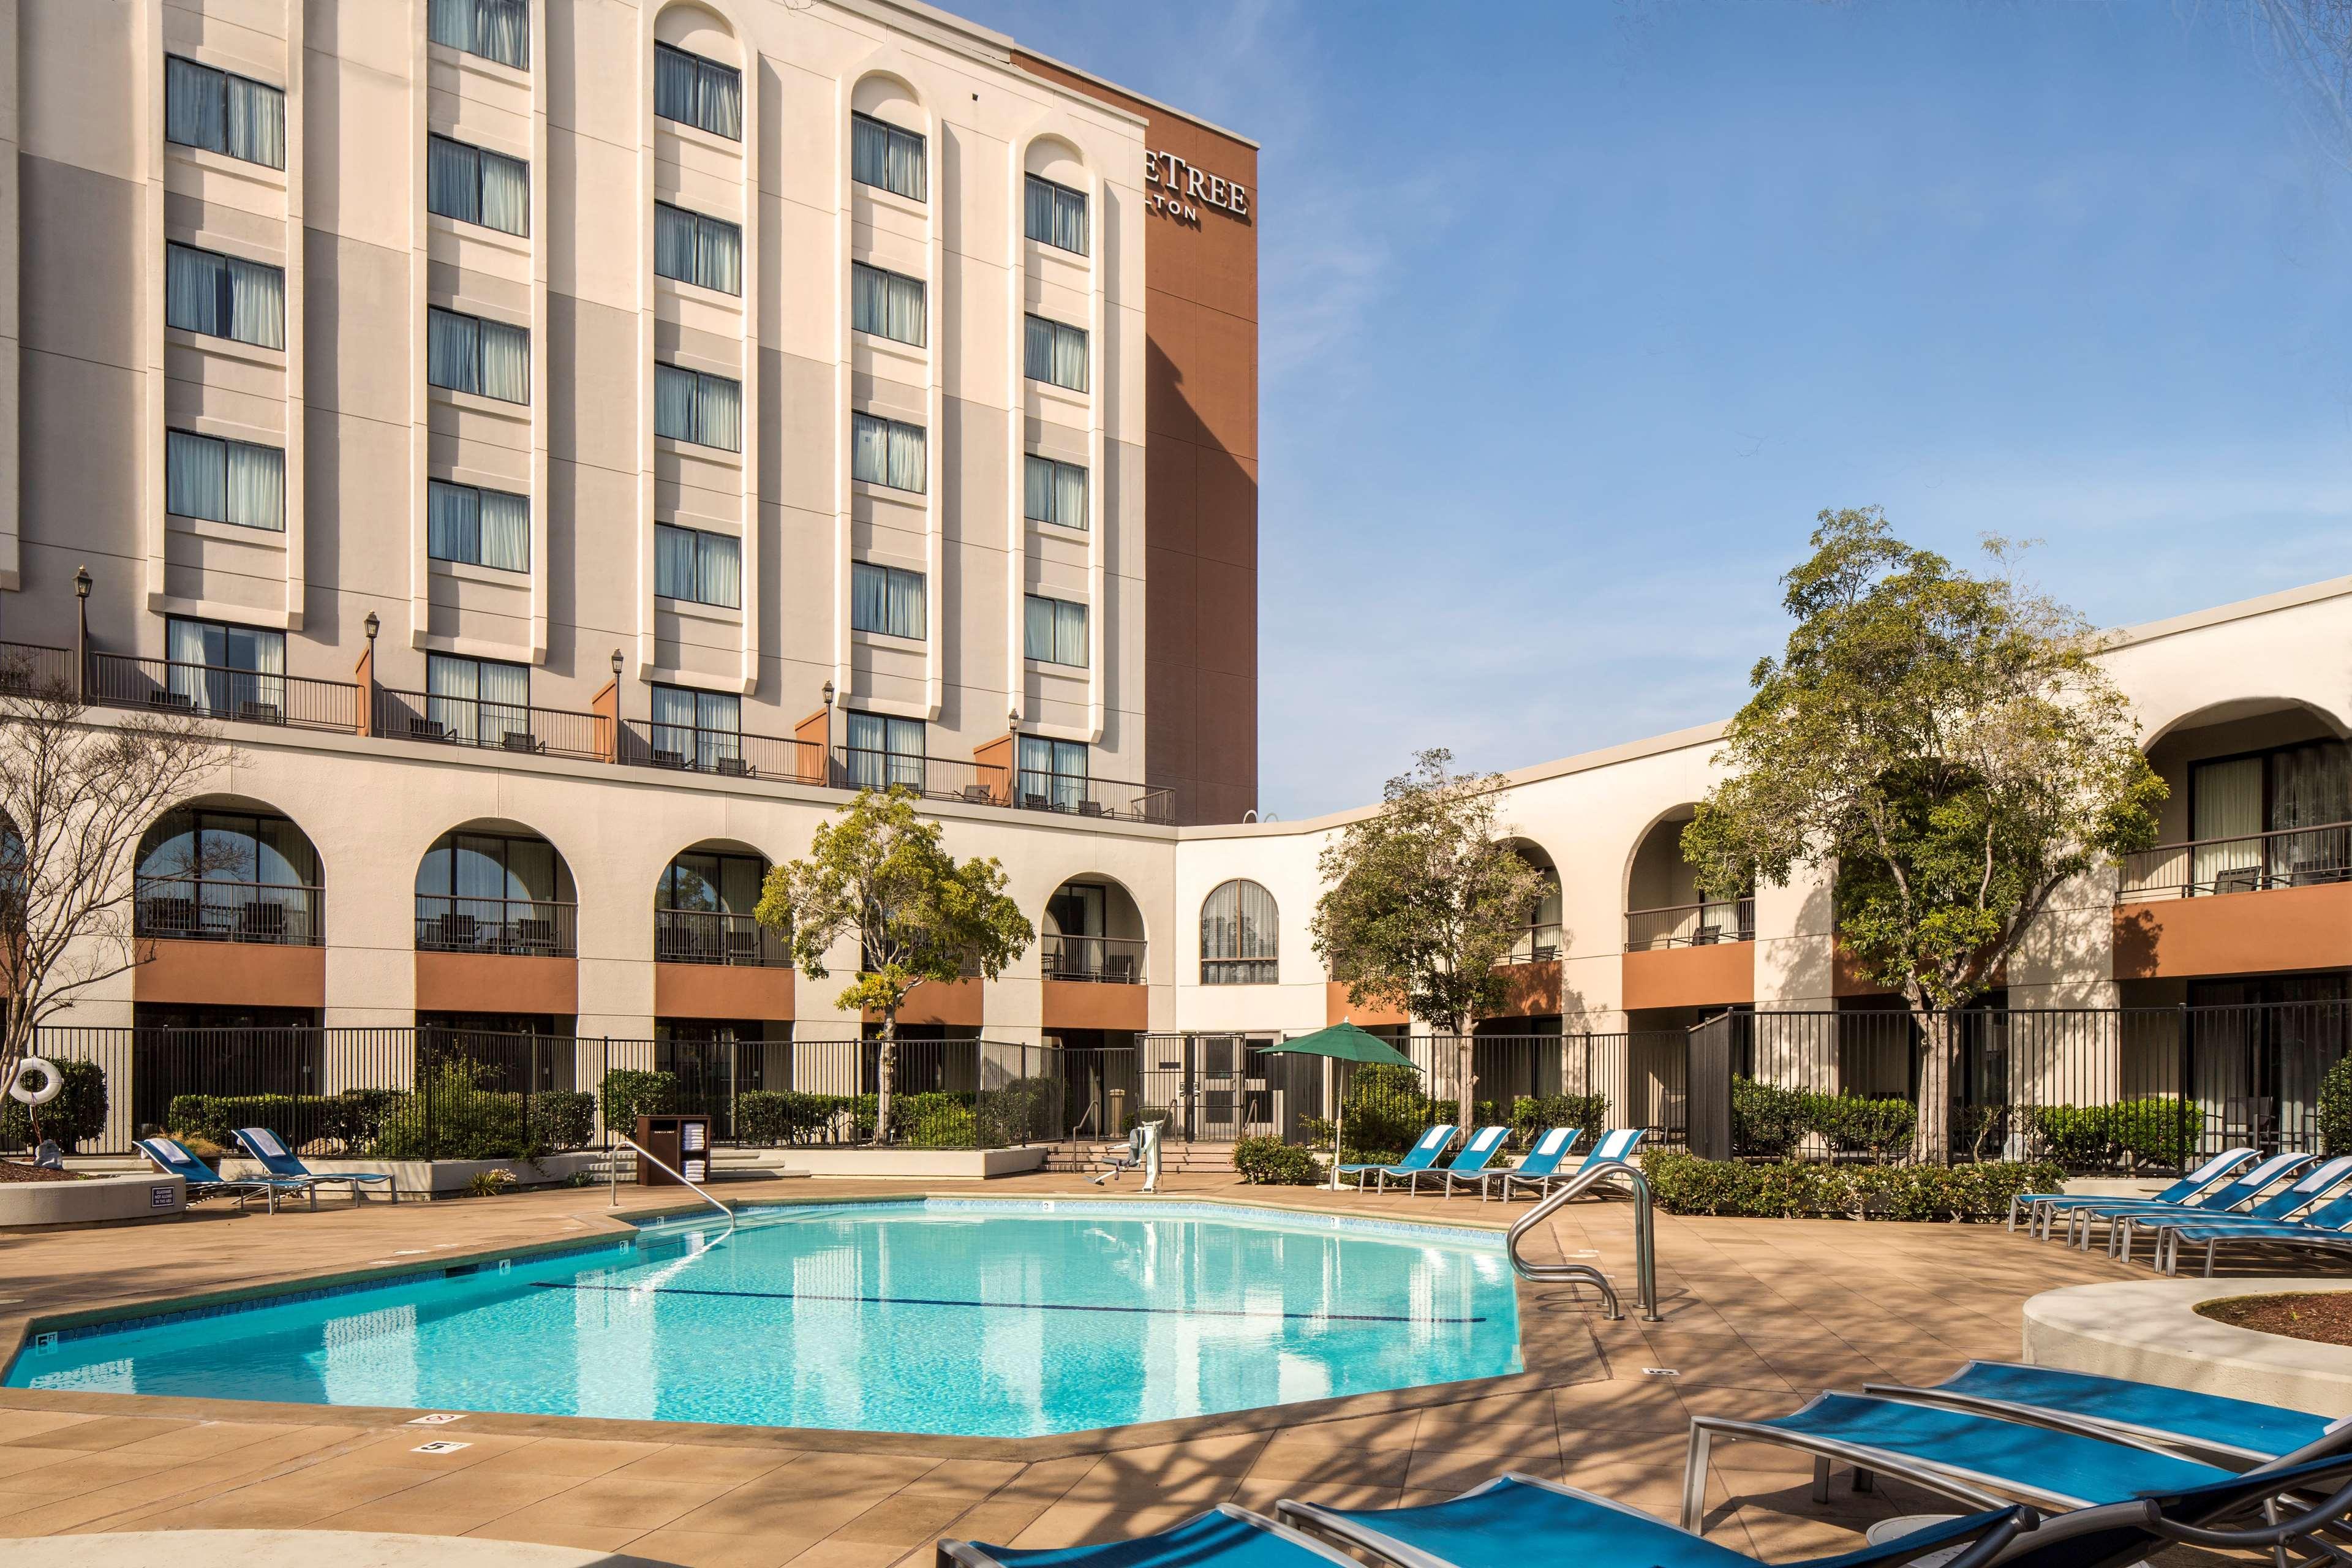 DoubleTree by Hilton Hotel Newark - Fremont image 0